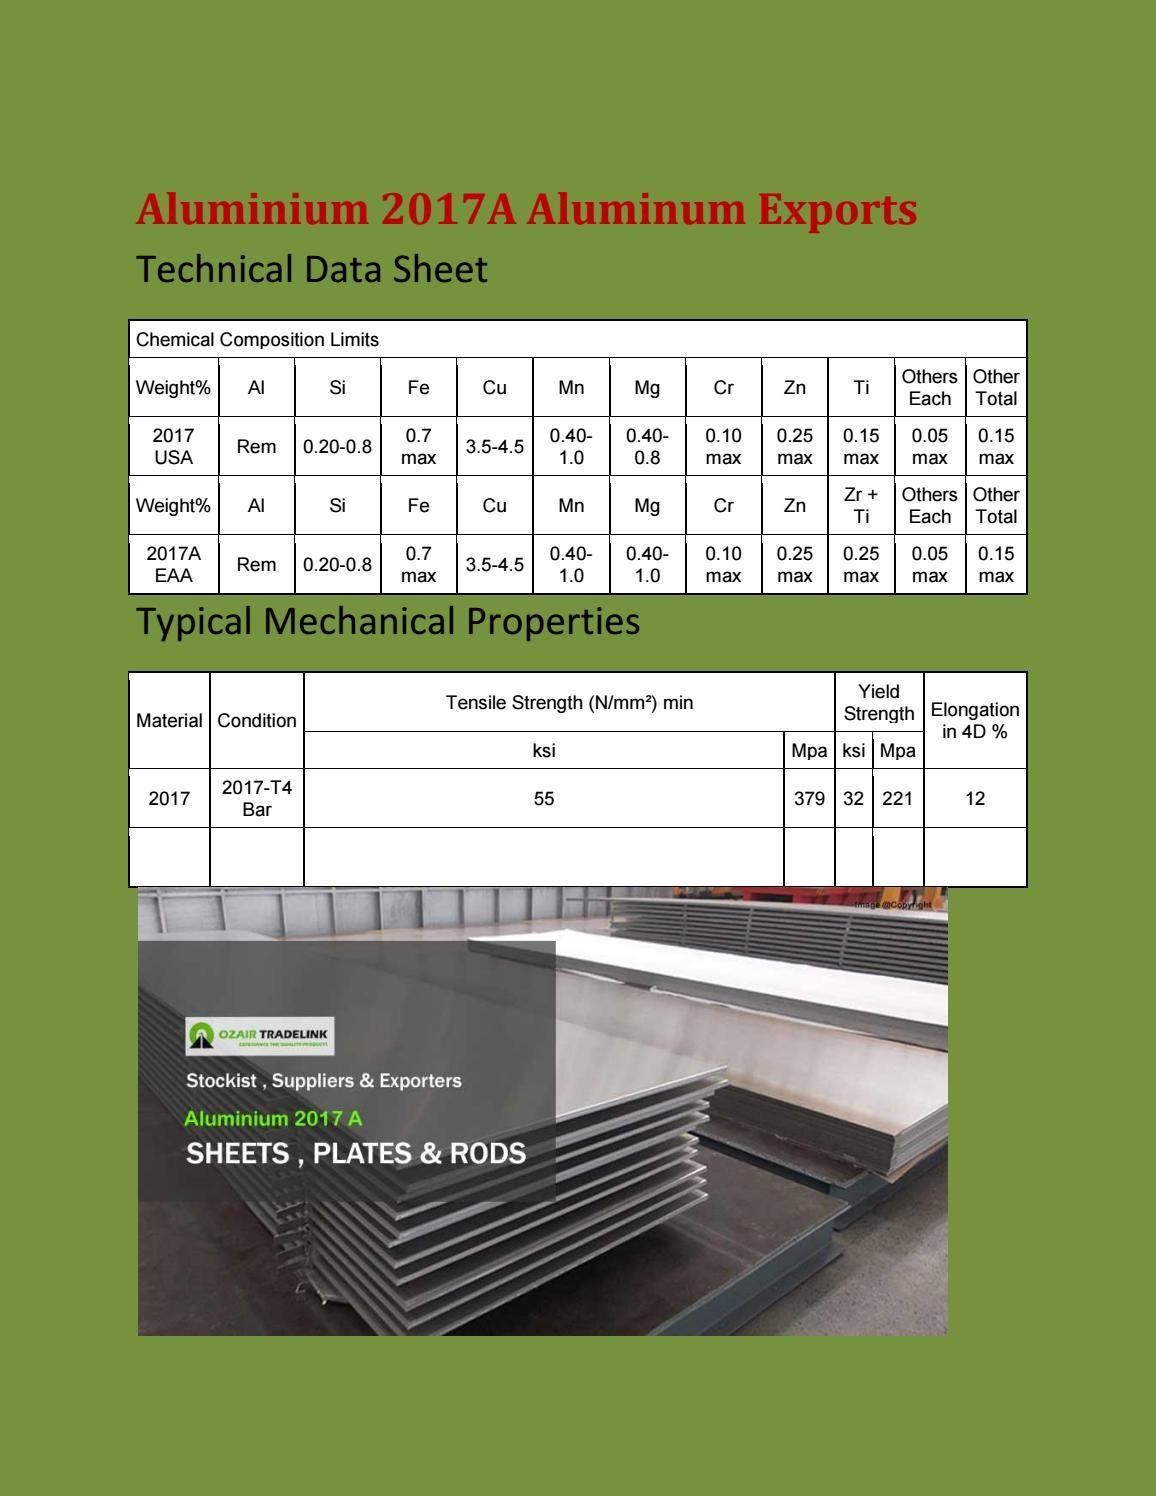 Aluminium 2017a Aluminum Exports Aluminium Stainless Steel Angle Aluminum